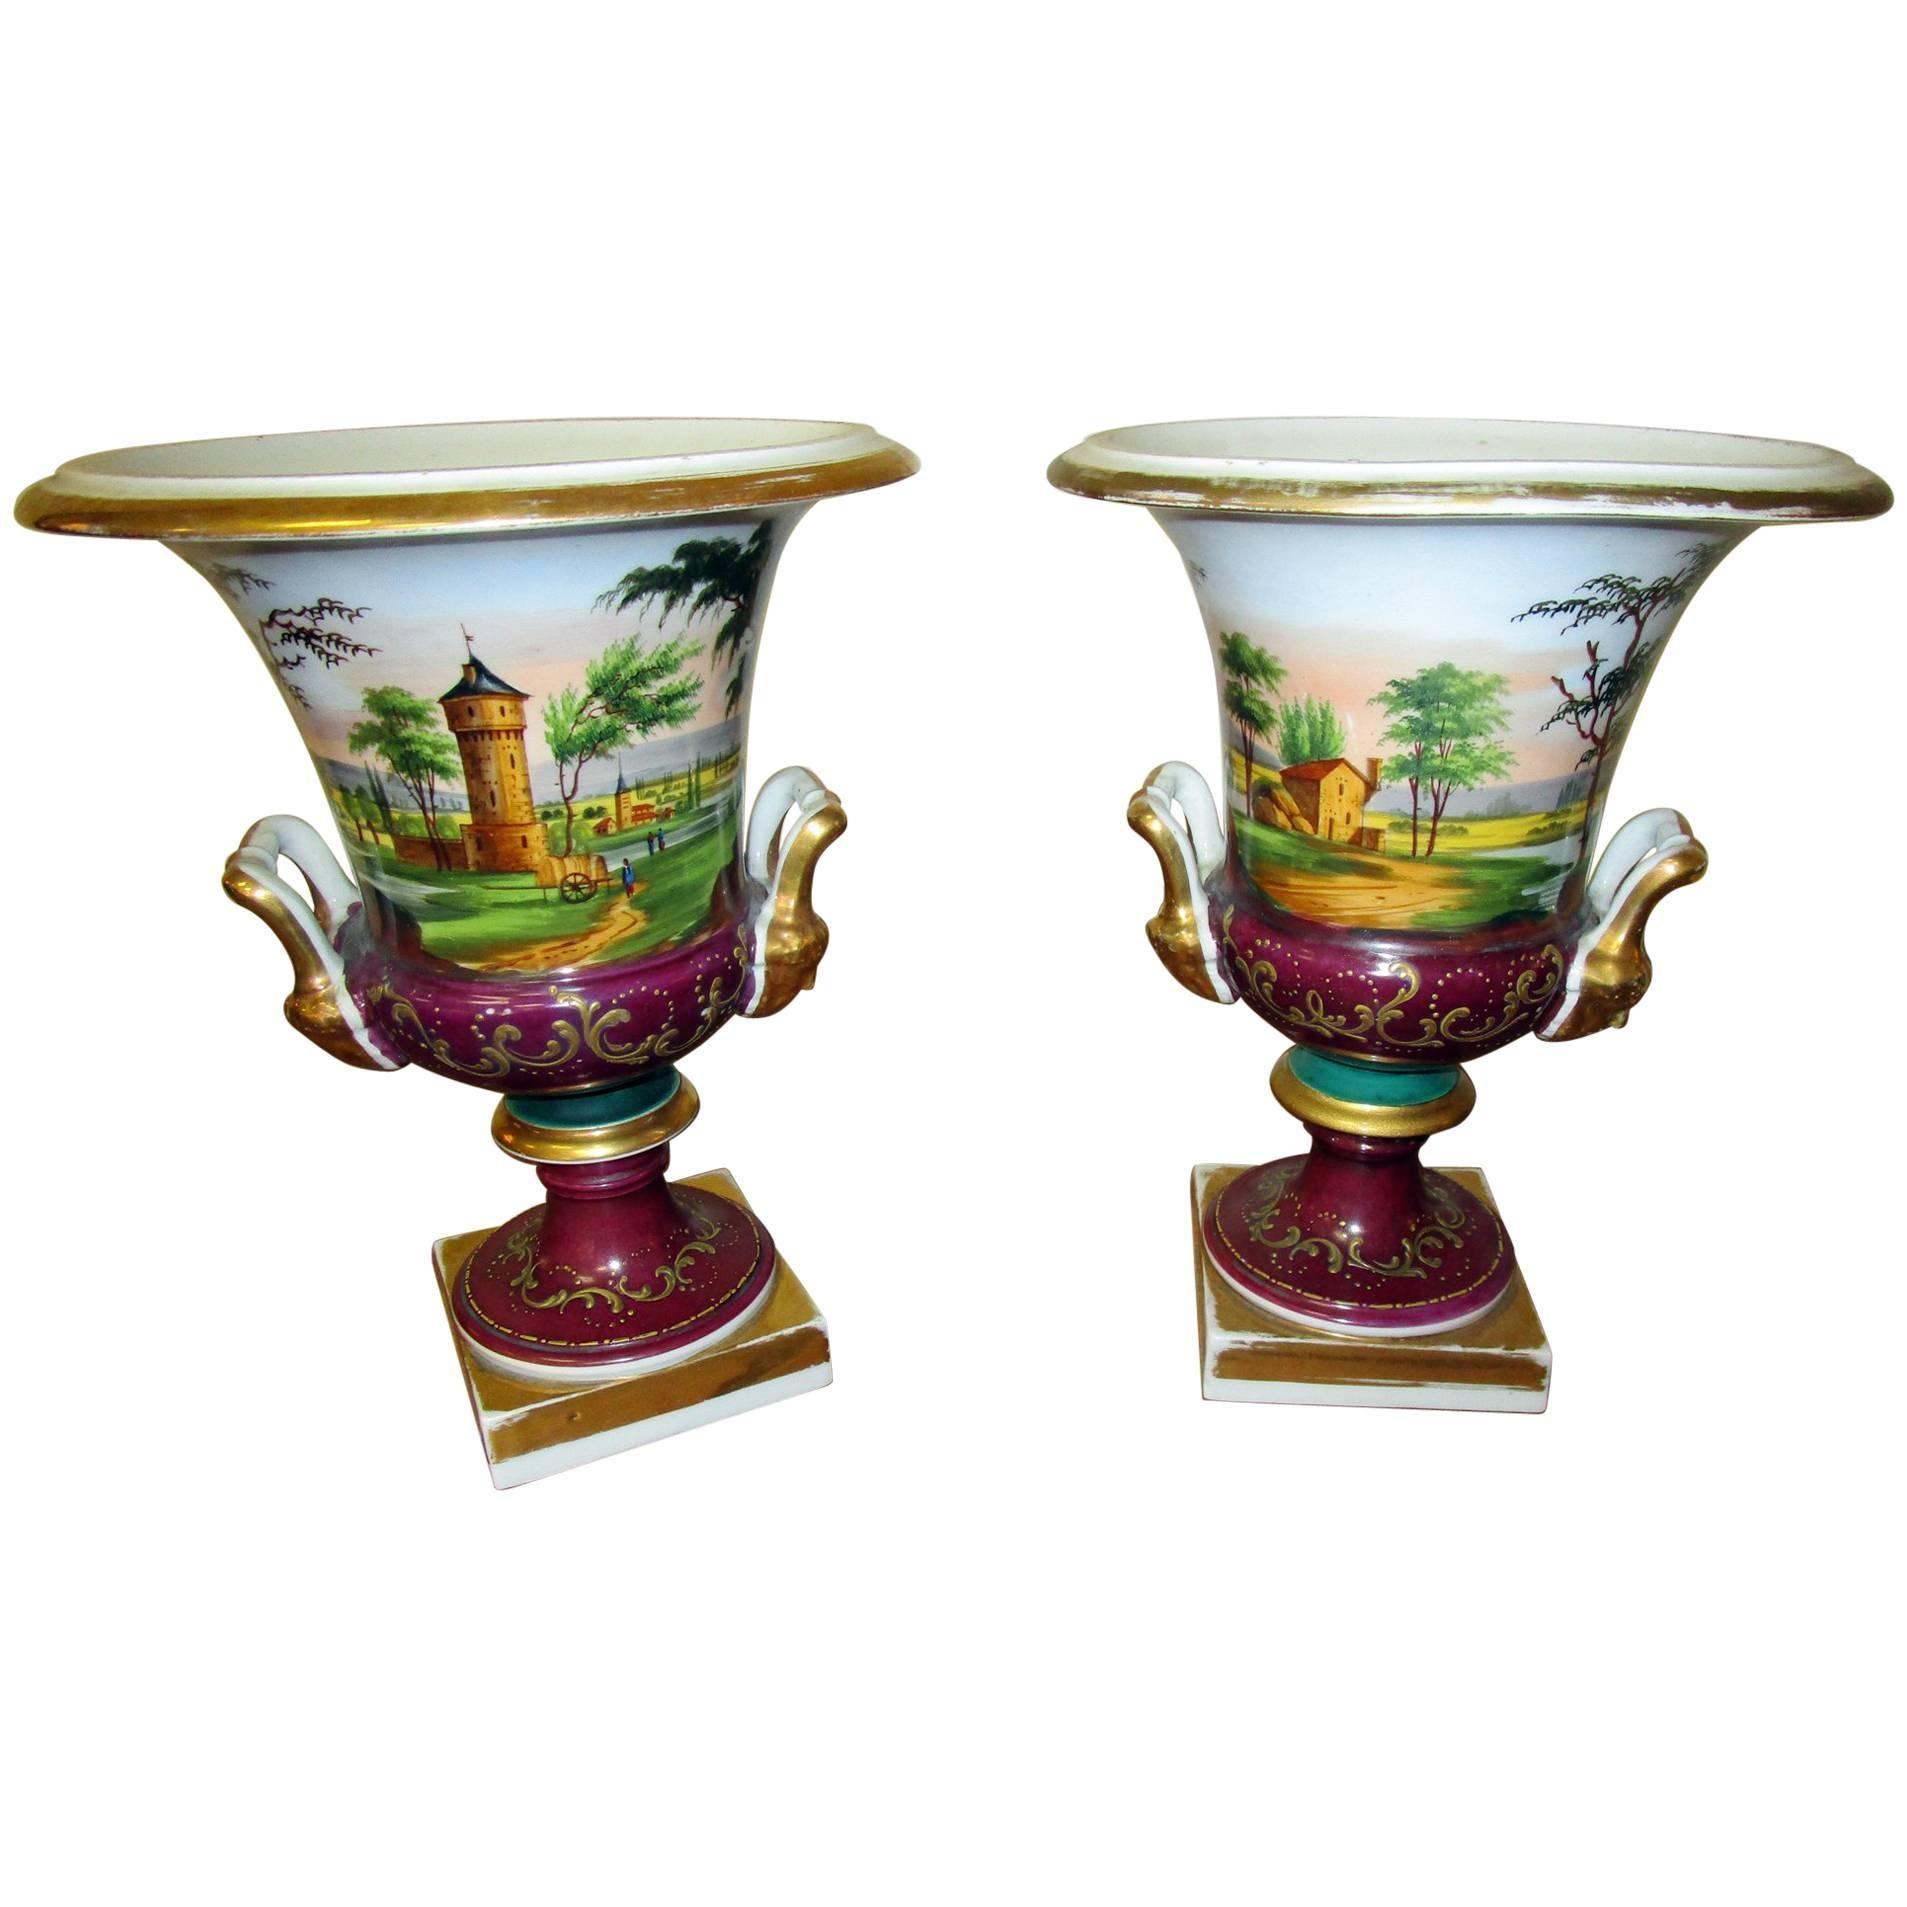 Pair of Vieux Paris Campagna Form Urns